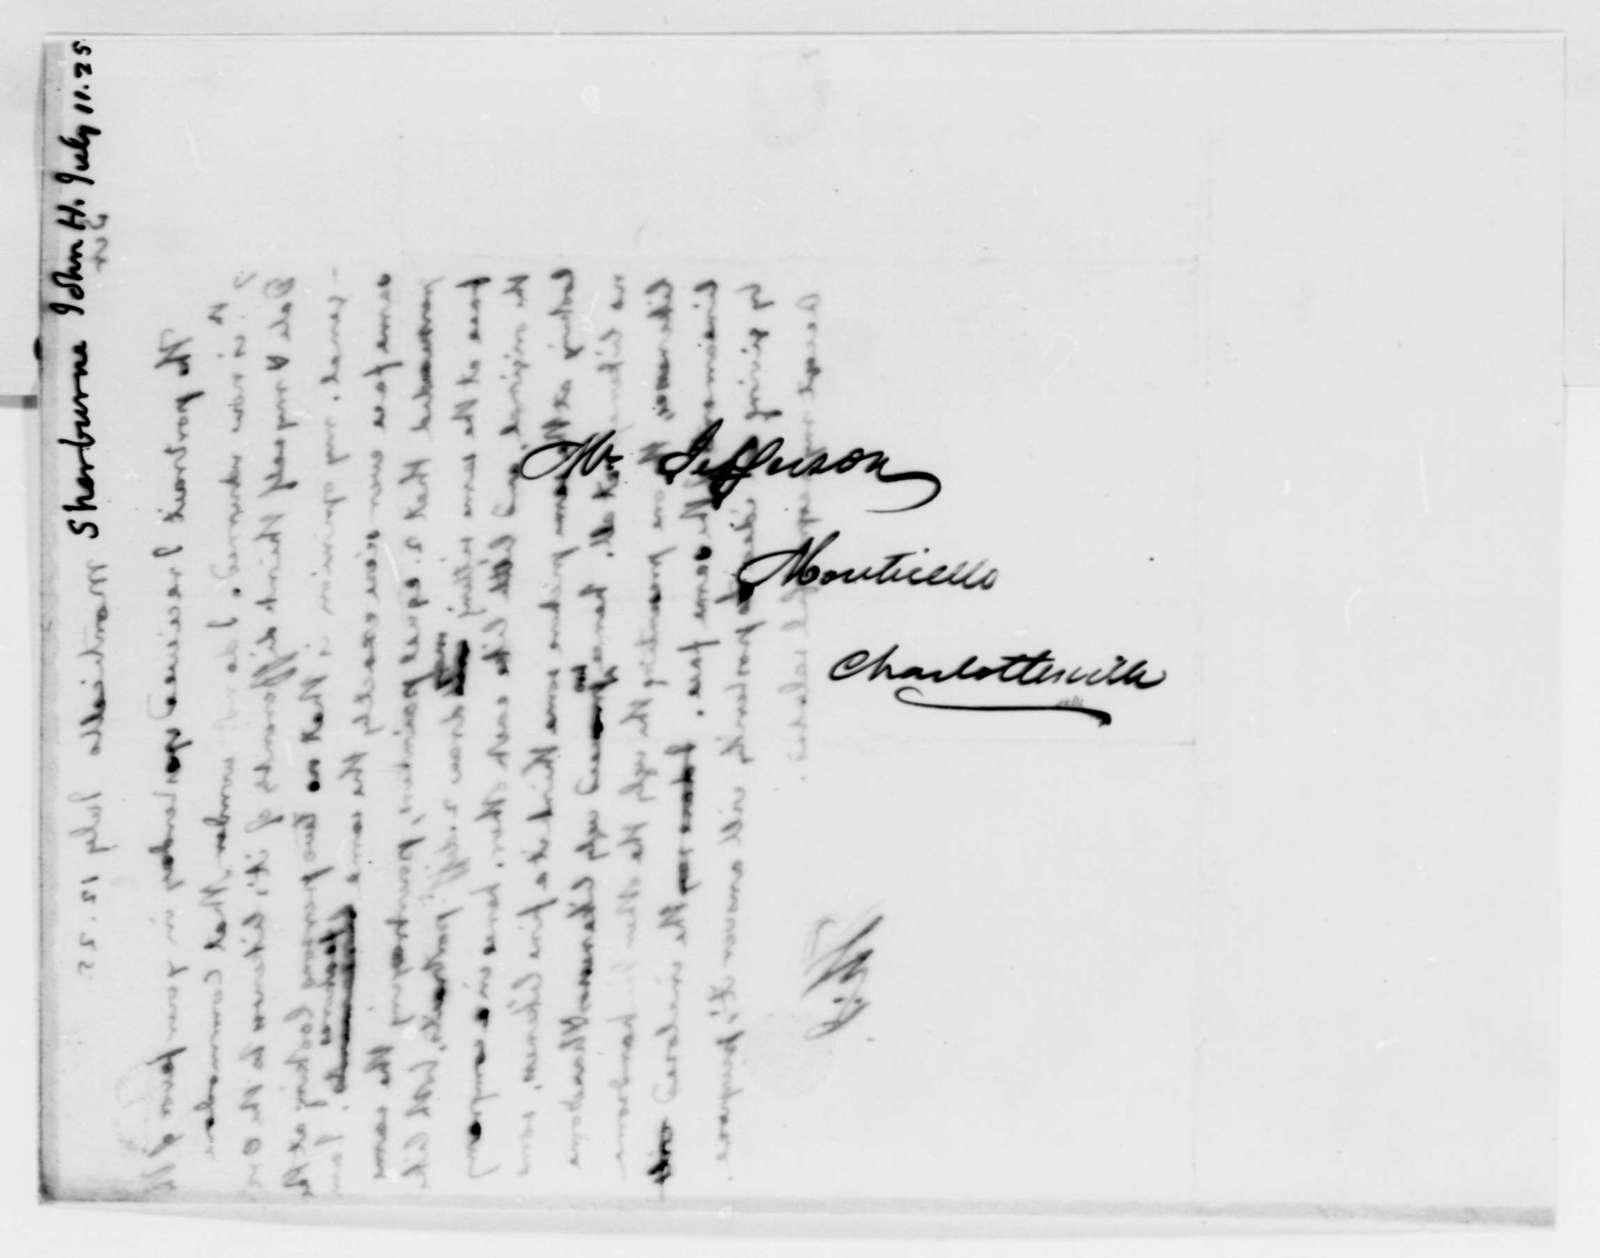 Thomas Jefferson to John Henry Sherburne, July 12, 1825